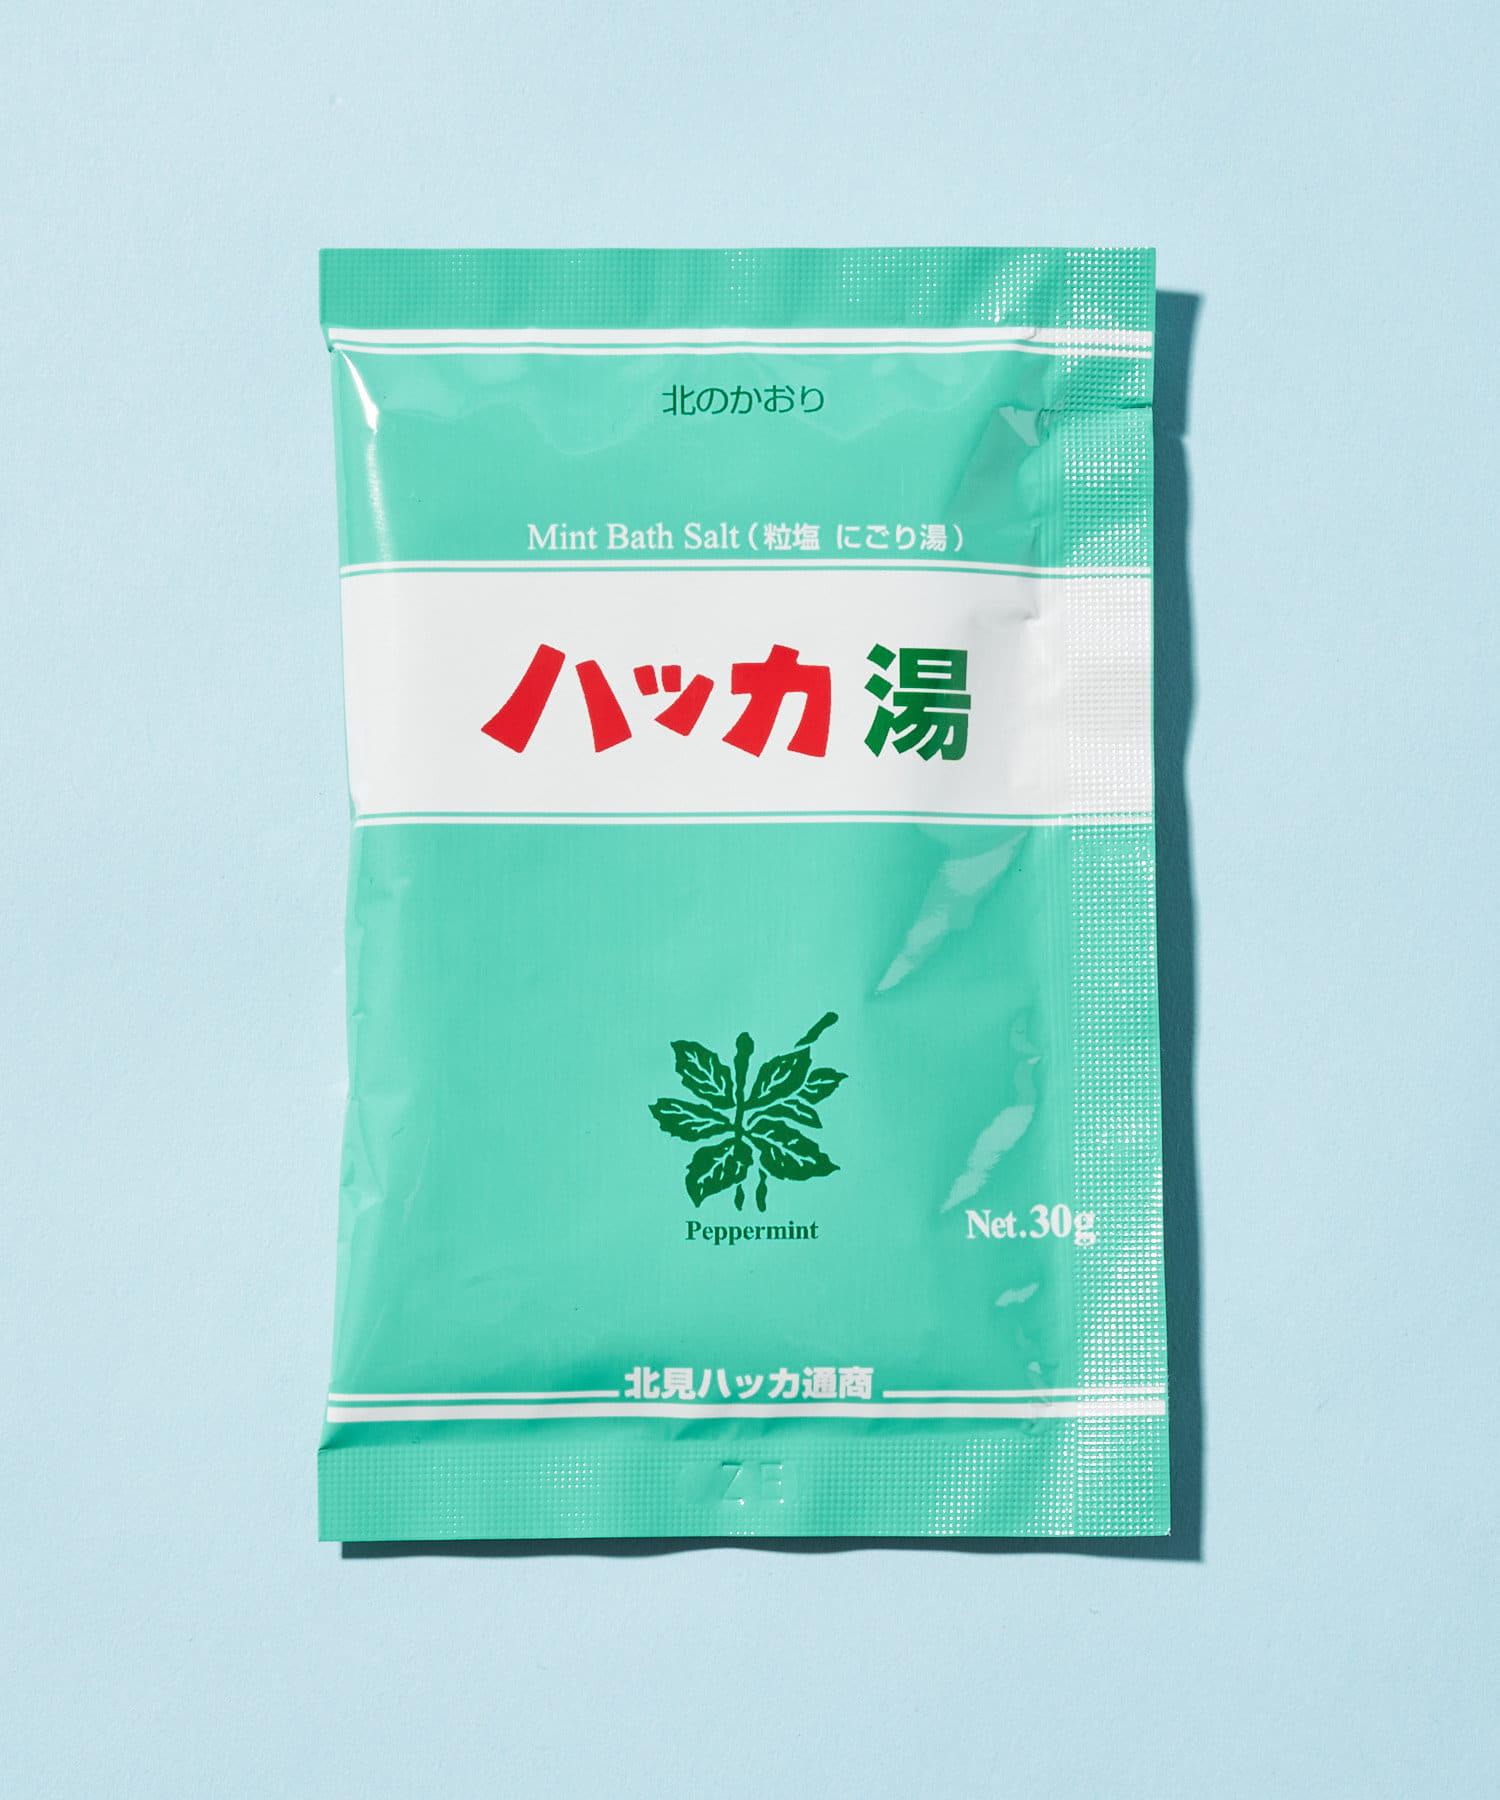 BONbazaar(ボンバザール) 【北見ハッカ】バスソルト(入浴剤)30g